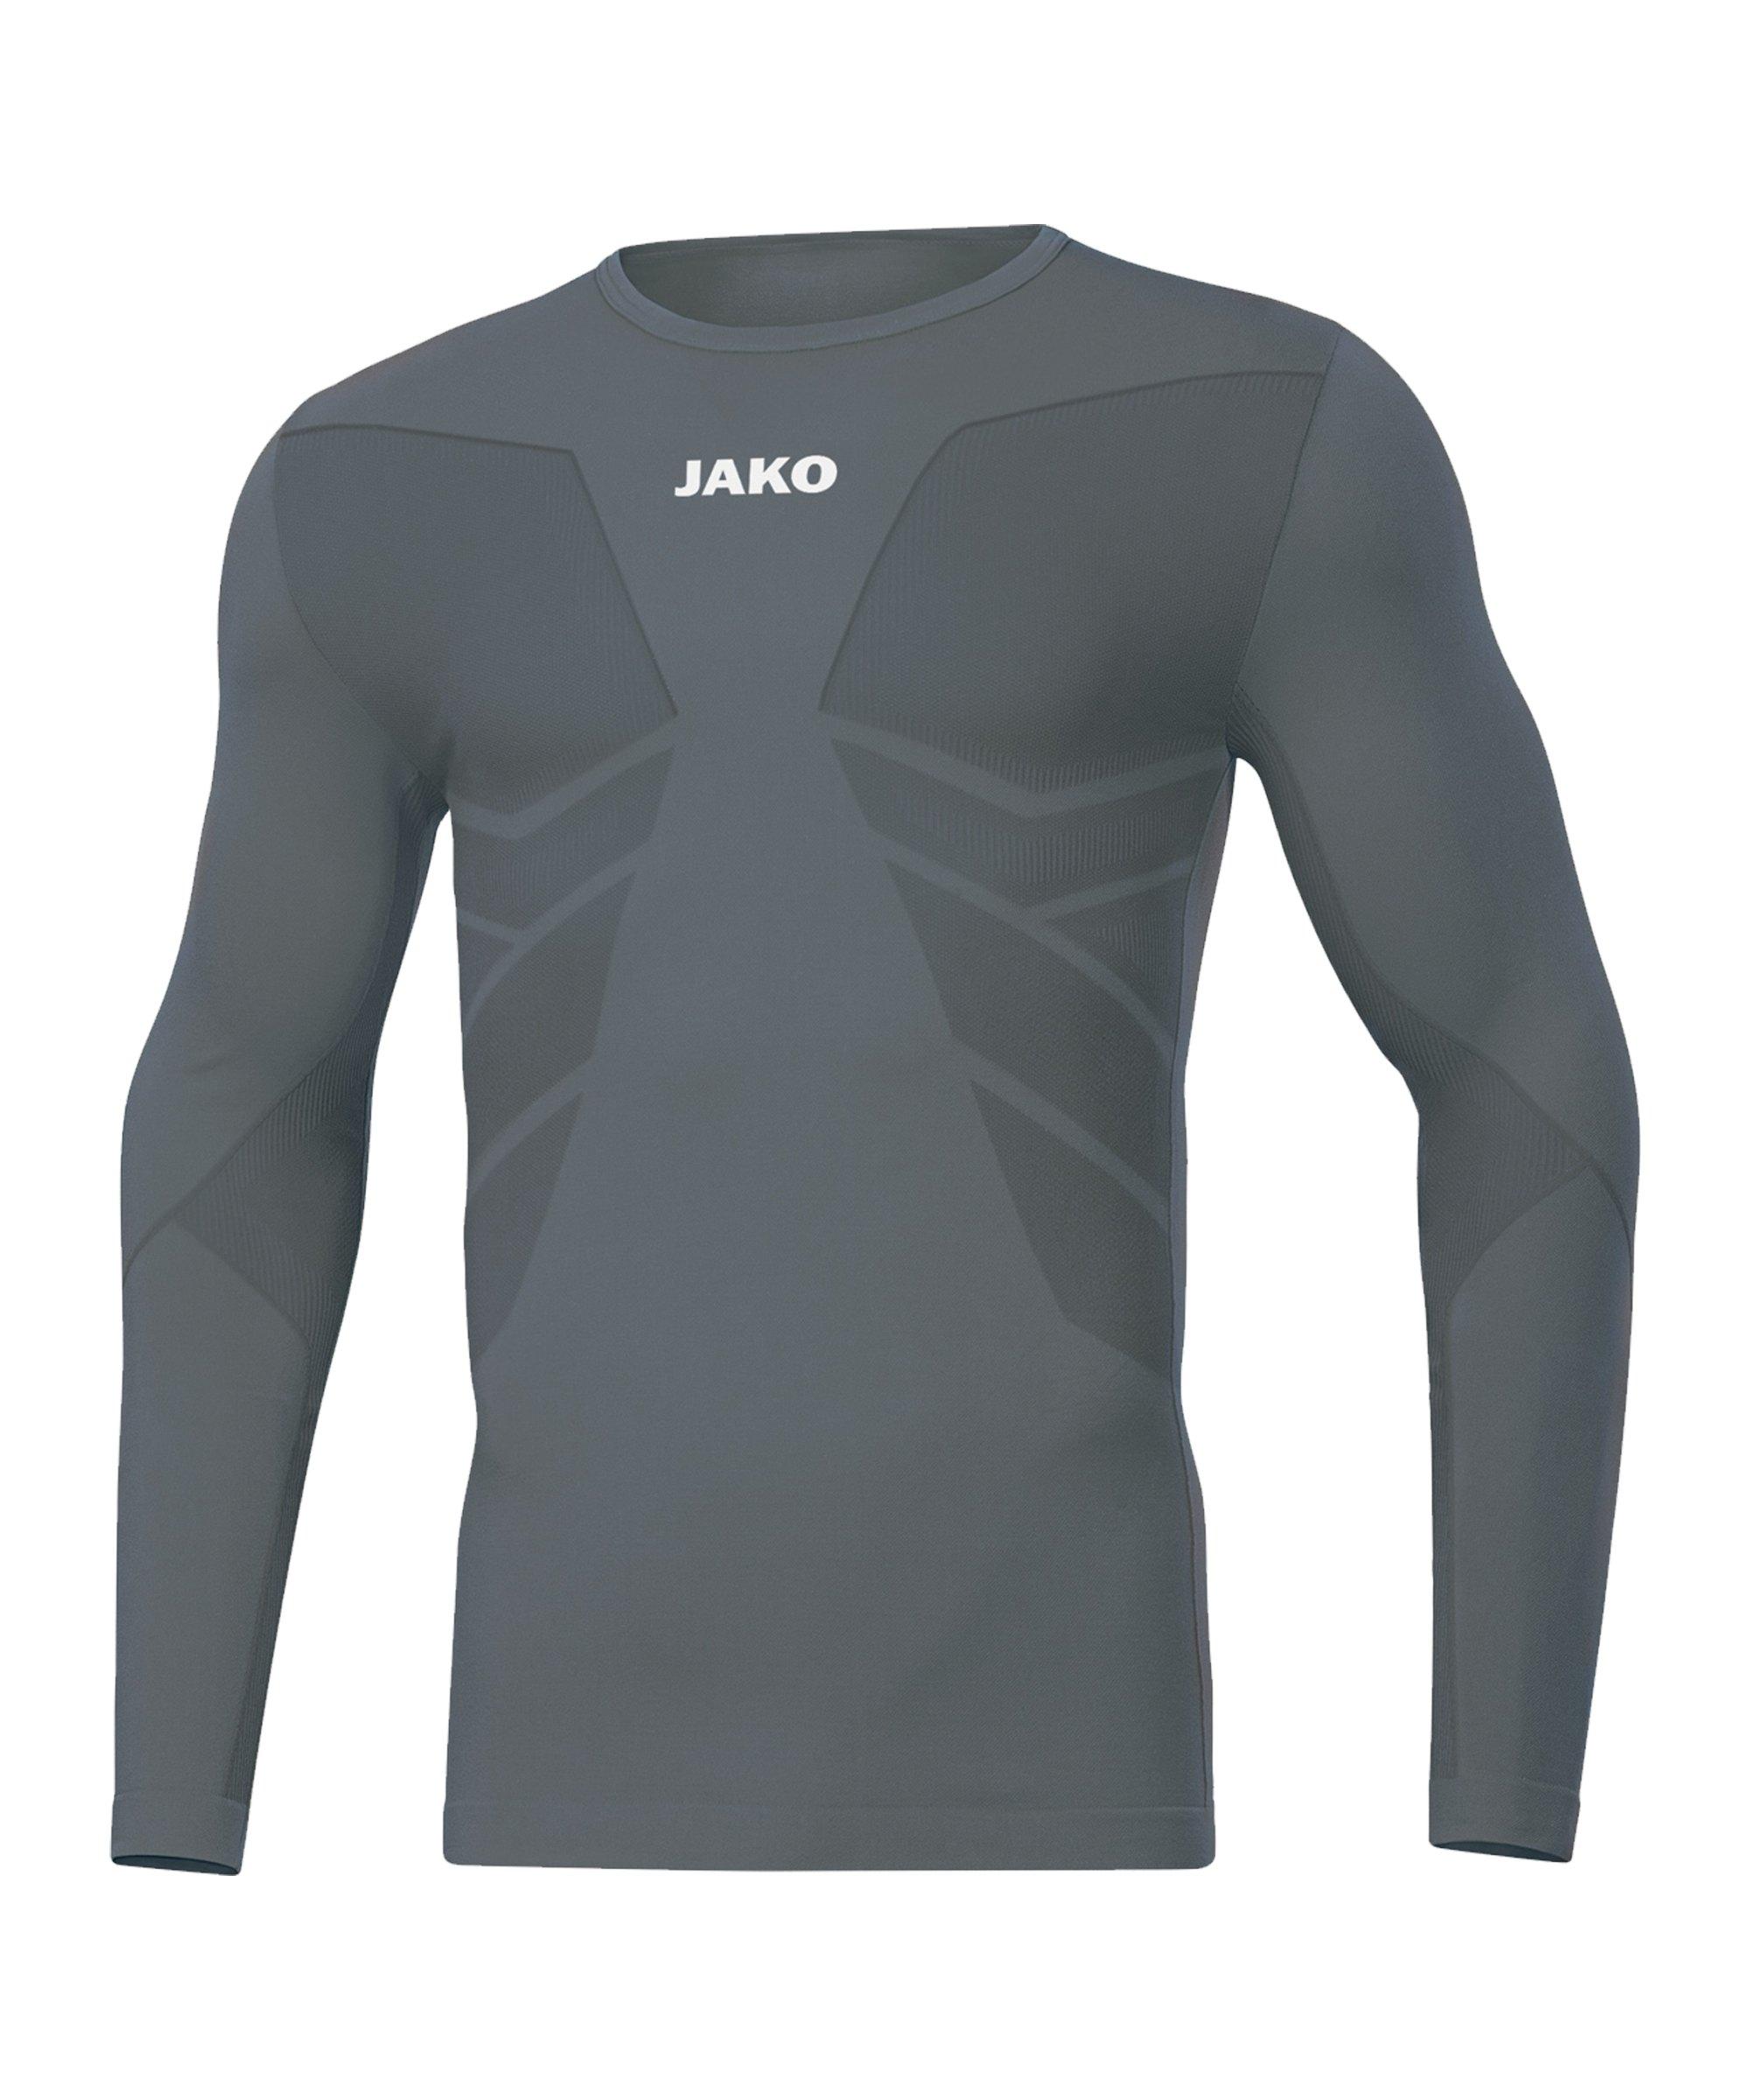 JAKO Comfort 2.0 langarm Kids Grau F40 - grau